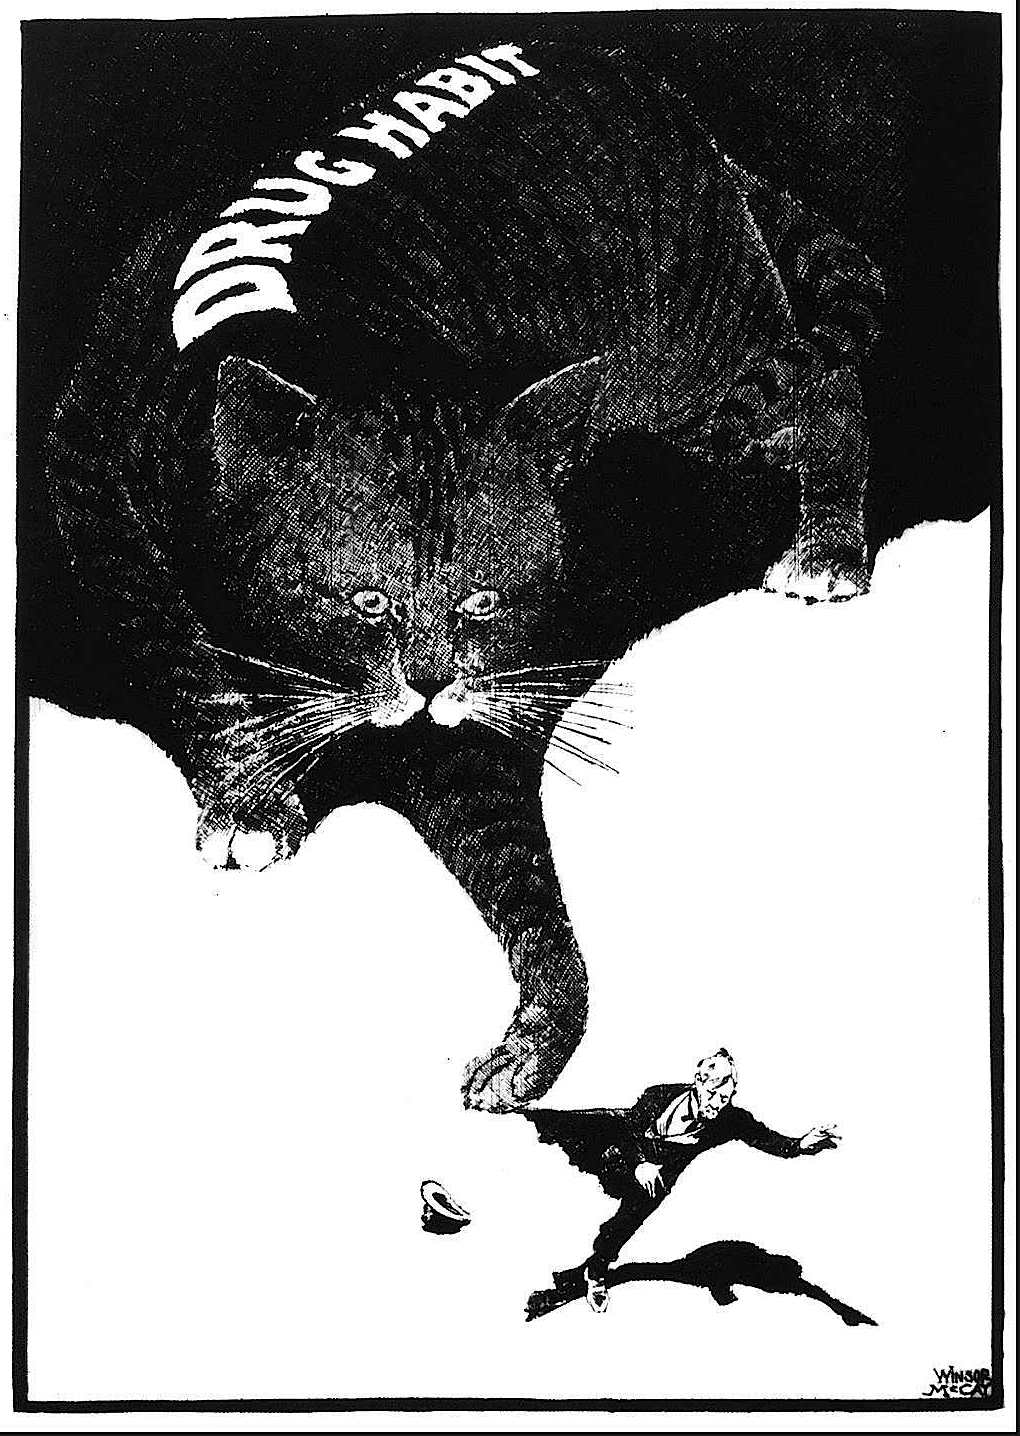 A Winsor Mccay cartoon about drug addiction